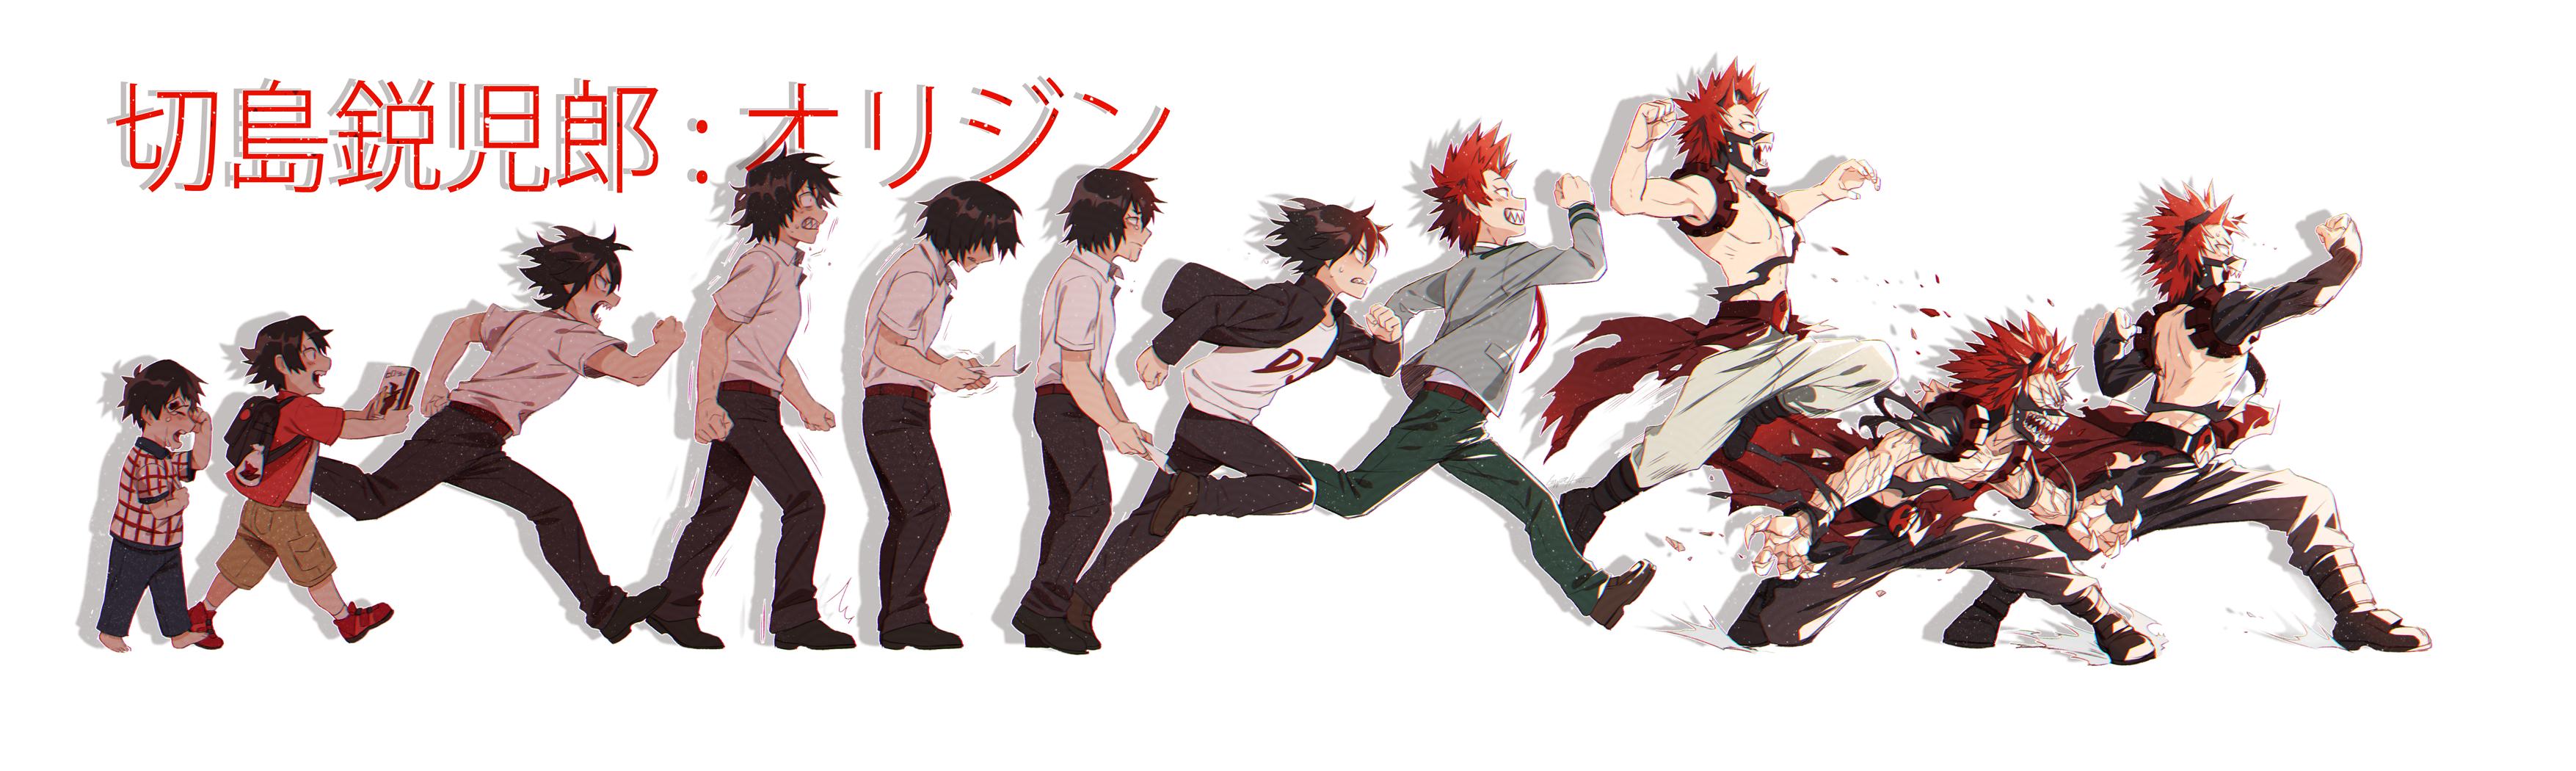 Kirishima Eijirou Boku No Hero Academia Drawn By Lowah Danbooru